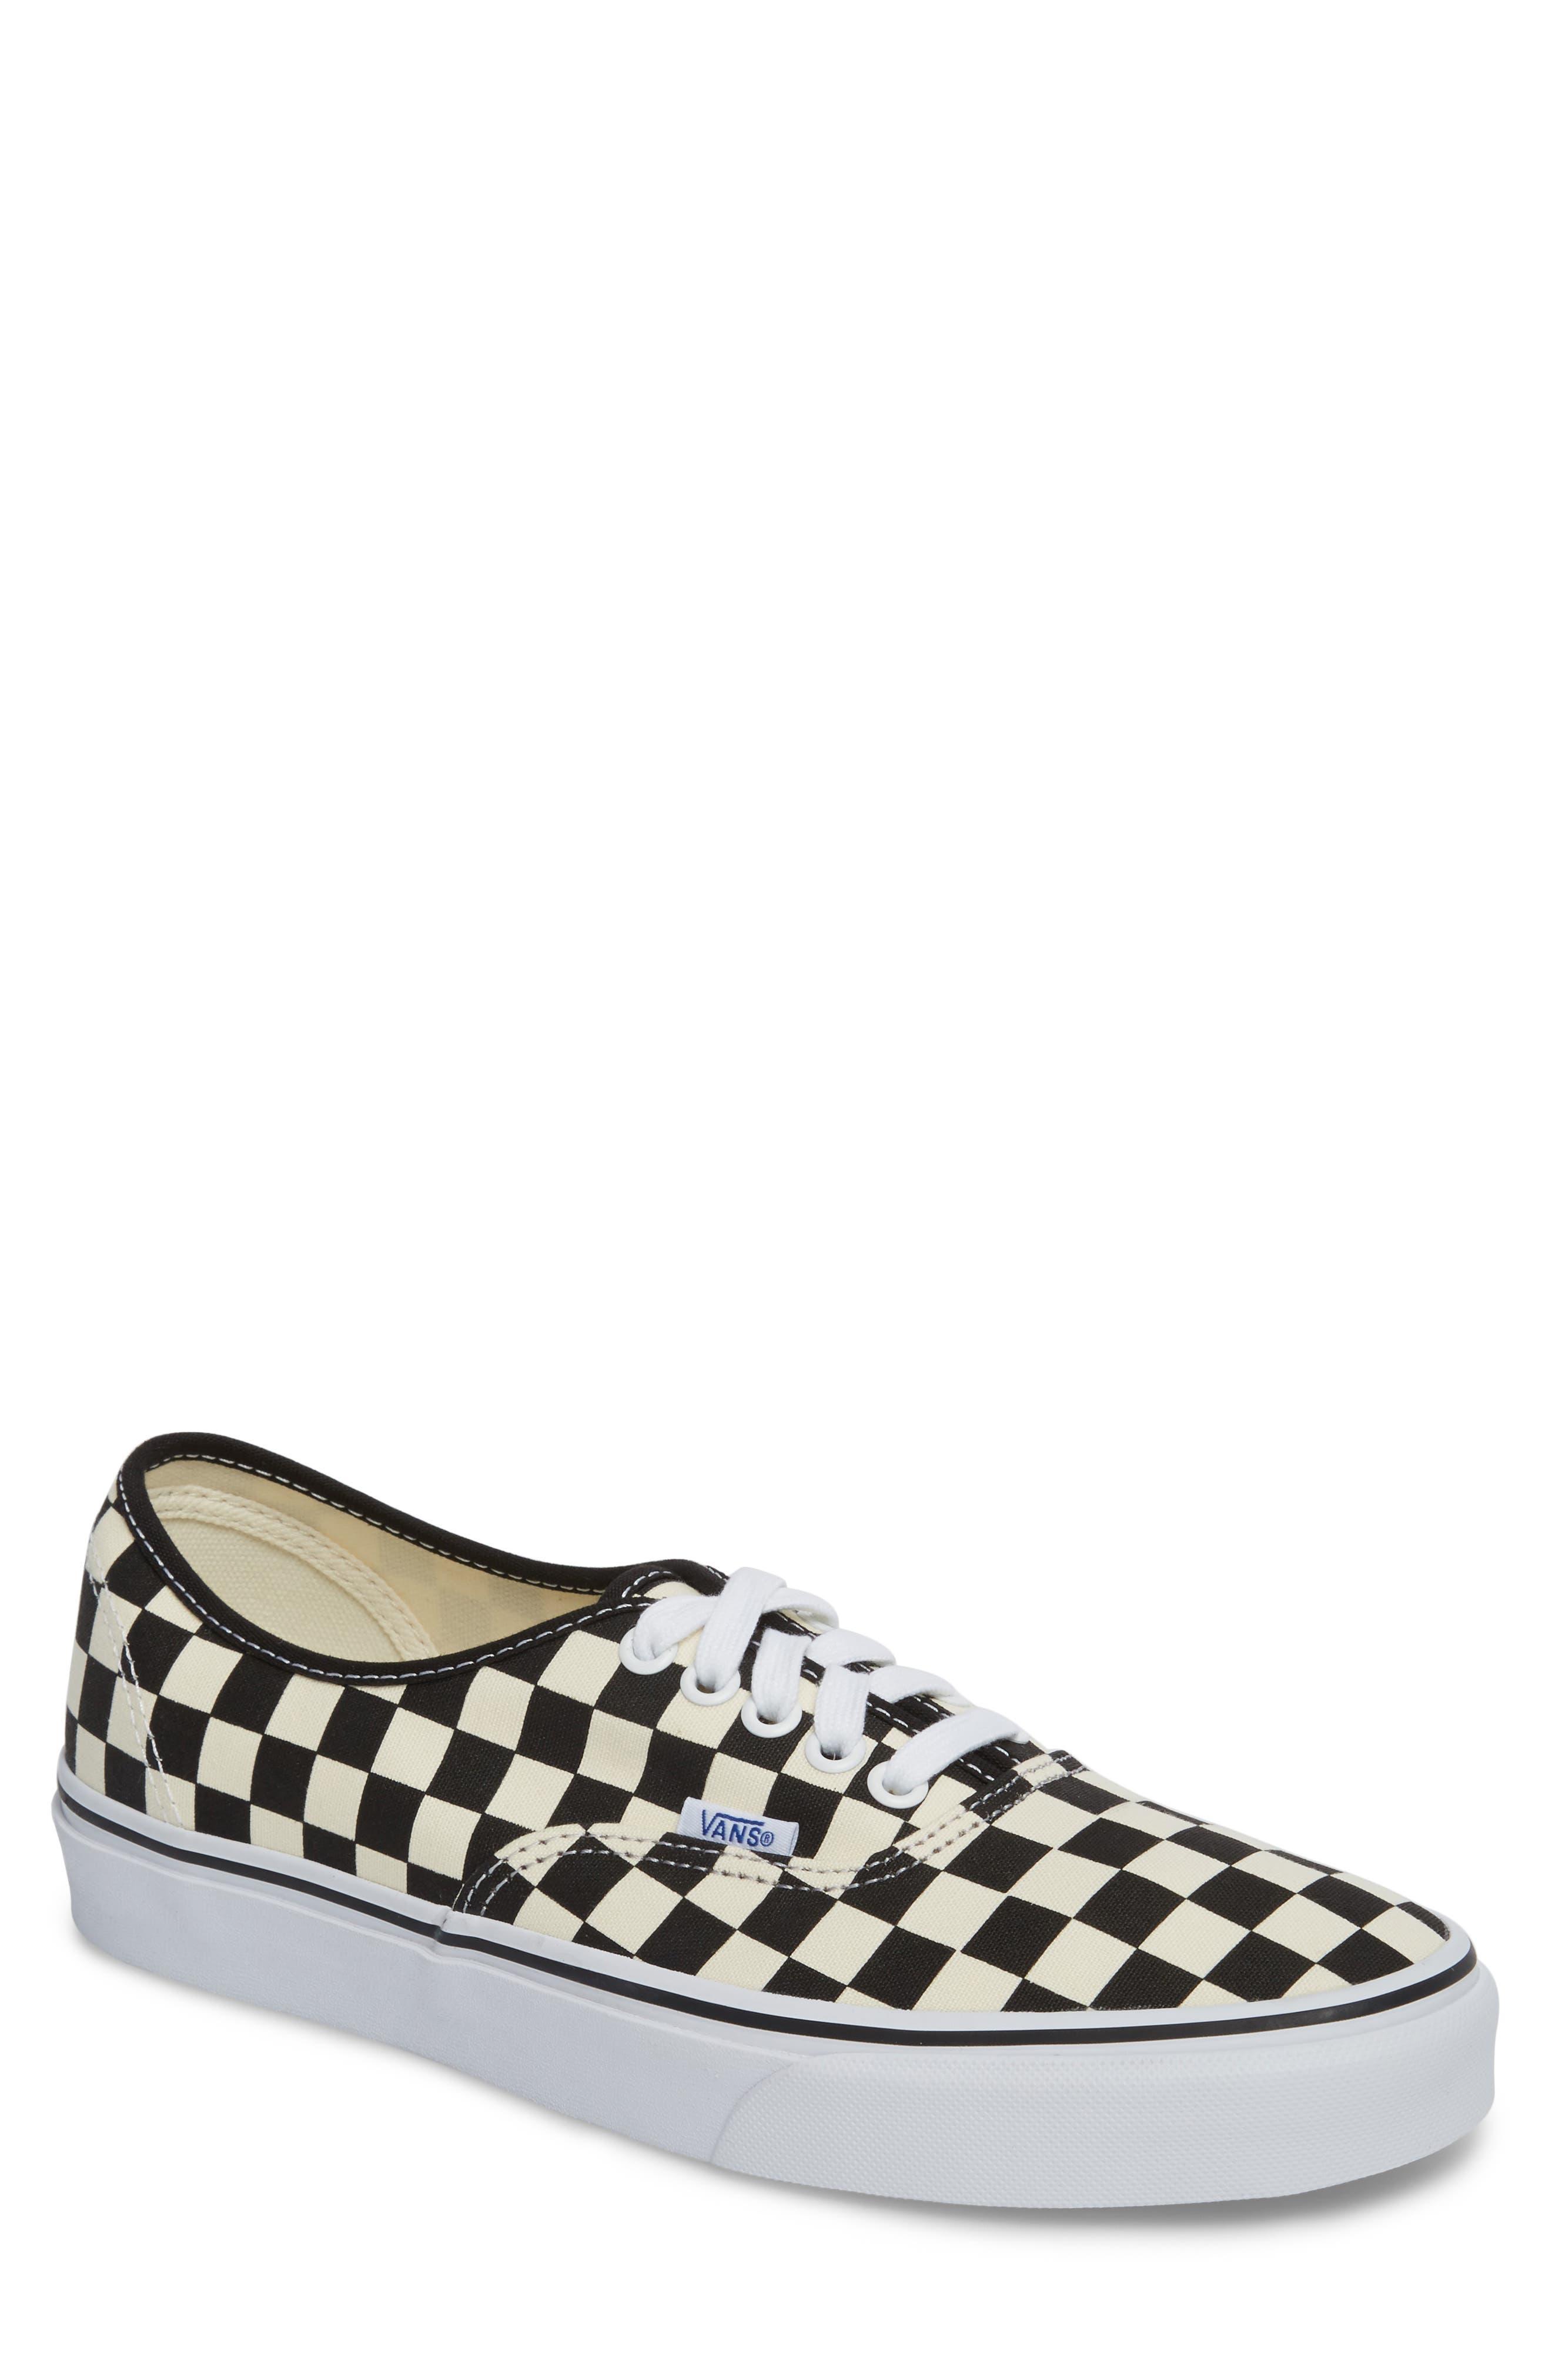 Authentic Golden Coast Sneaker,                             Main thumbnail 1, color,                             BLACK/ WHITE CHECKER